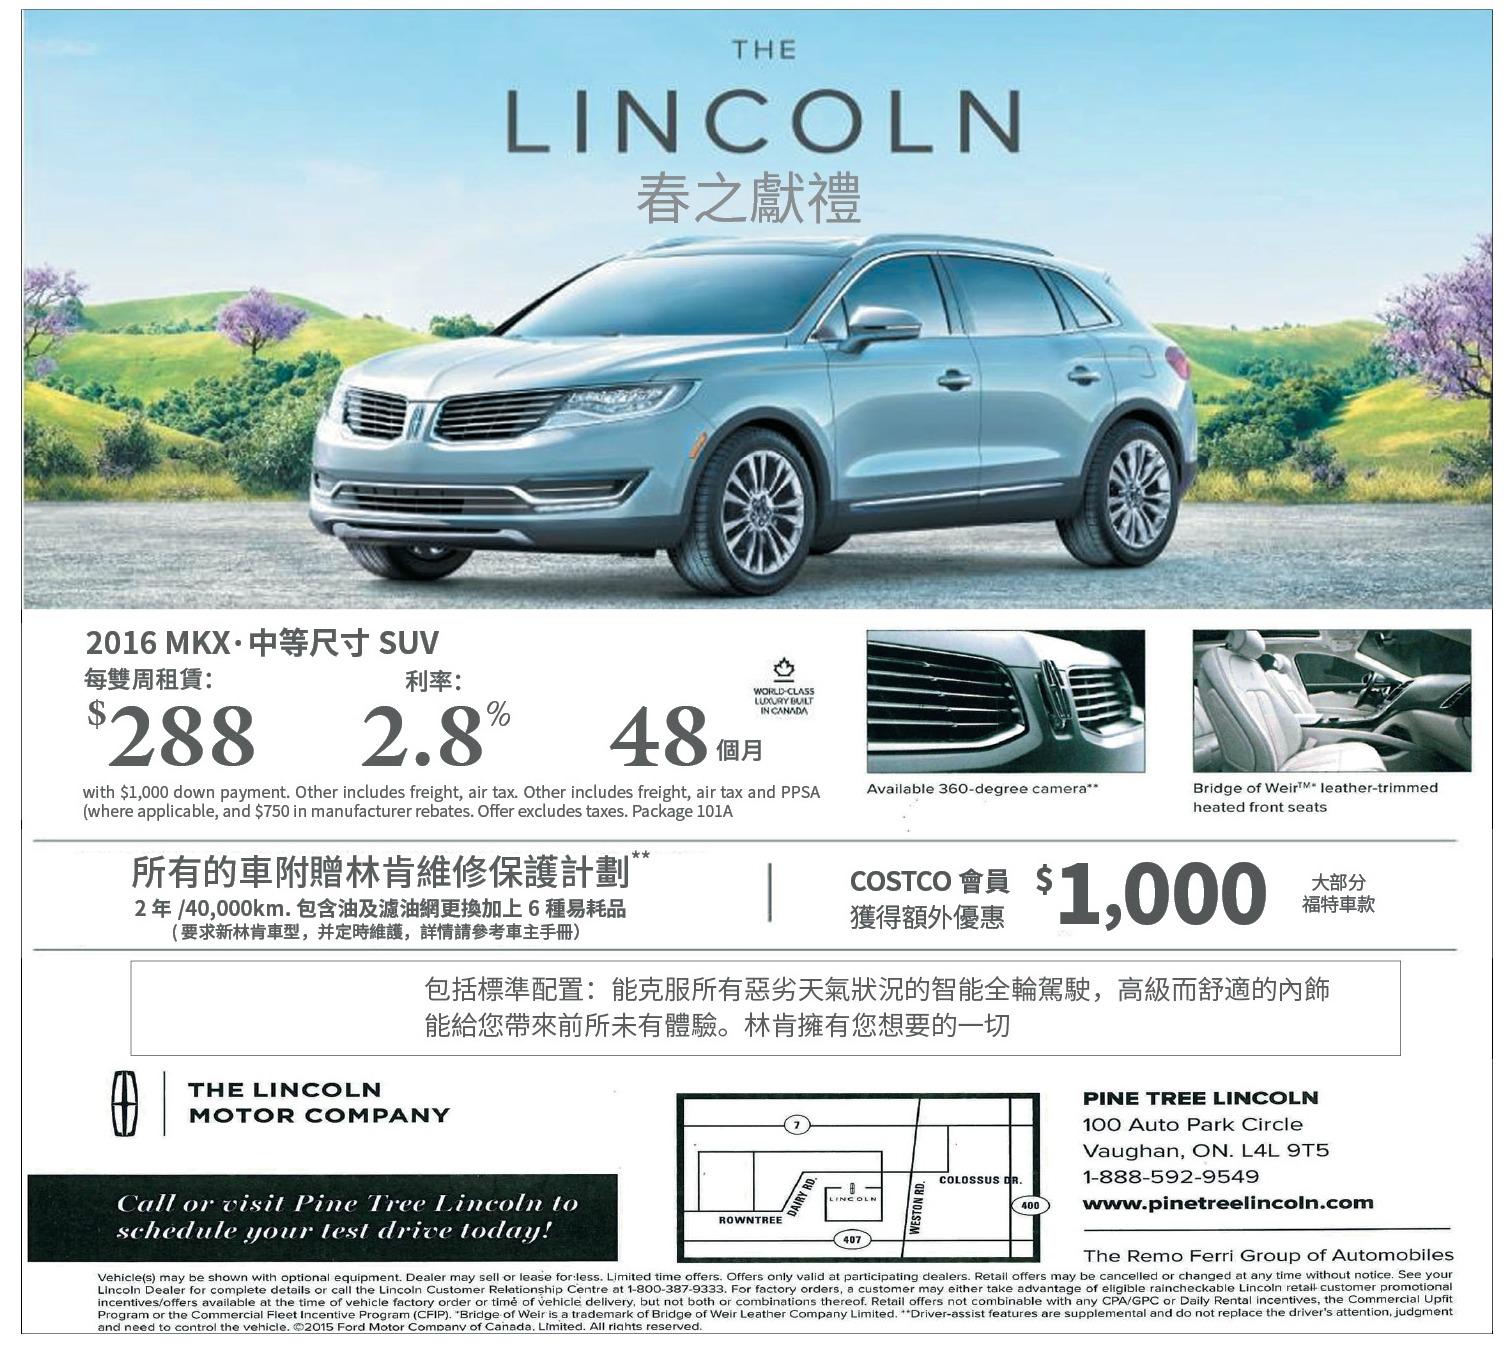 2016 Lincoln Cars: 林肯春之献礼 2016款Lincoln MKX中等尺寸SUV 双周租赁288元